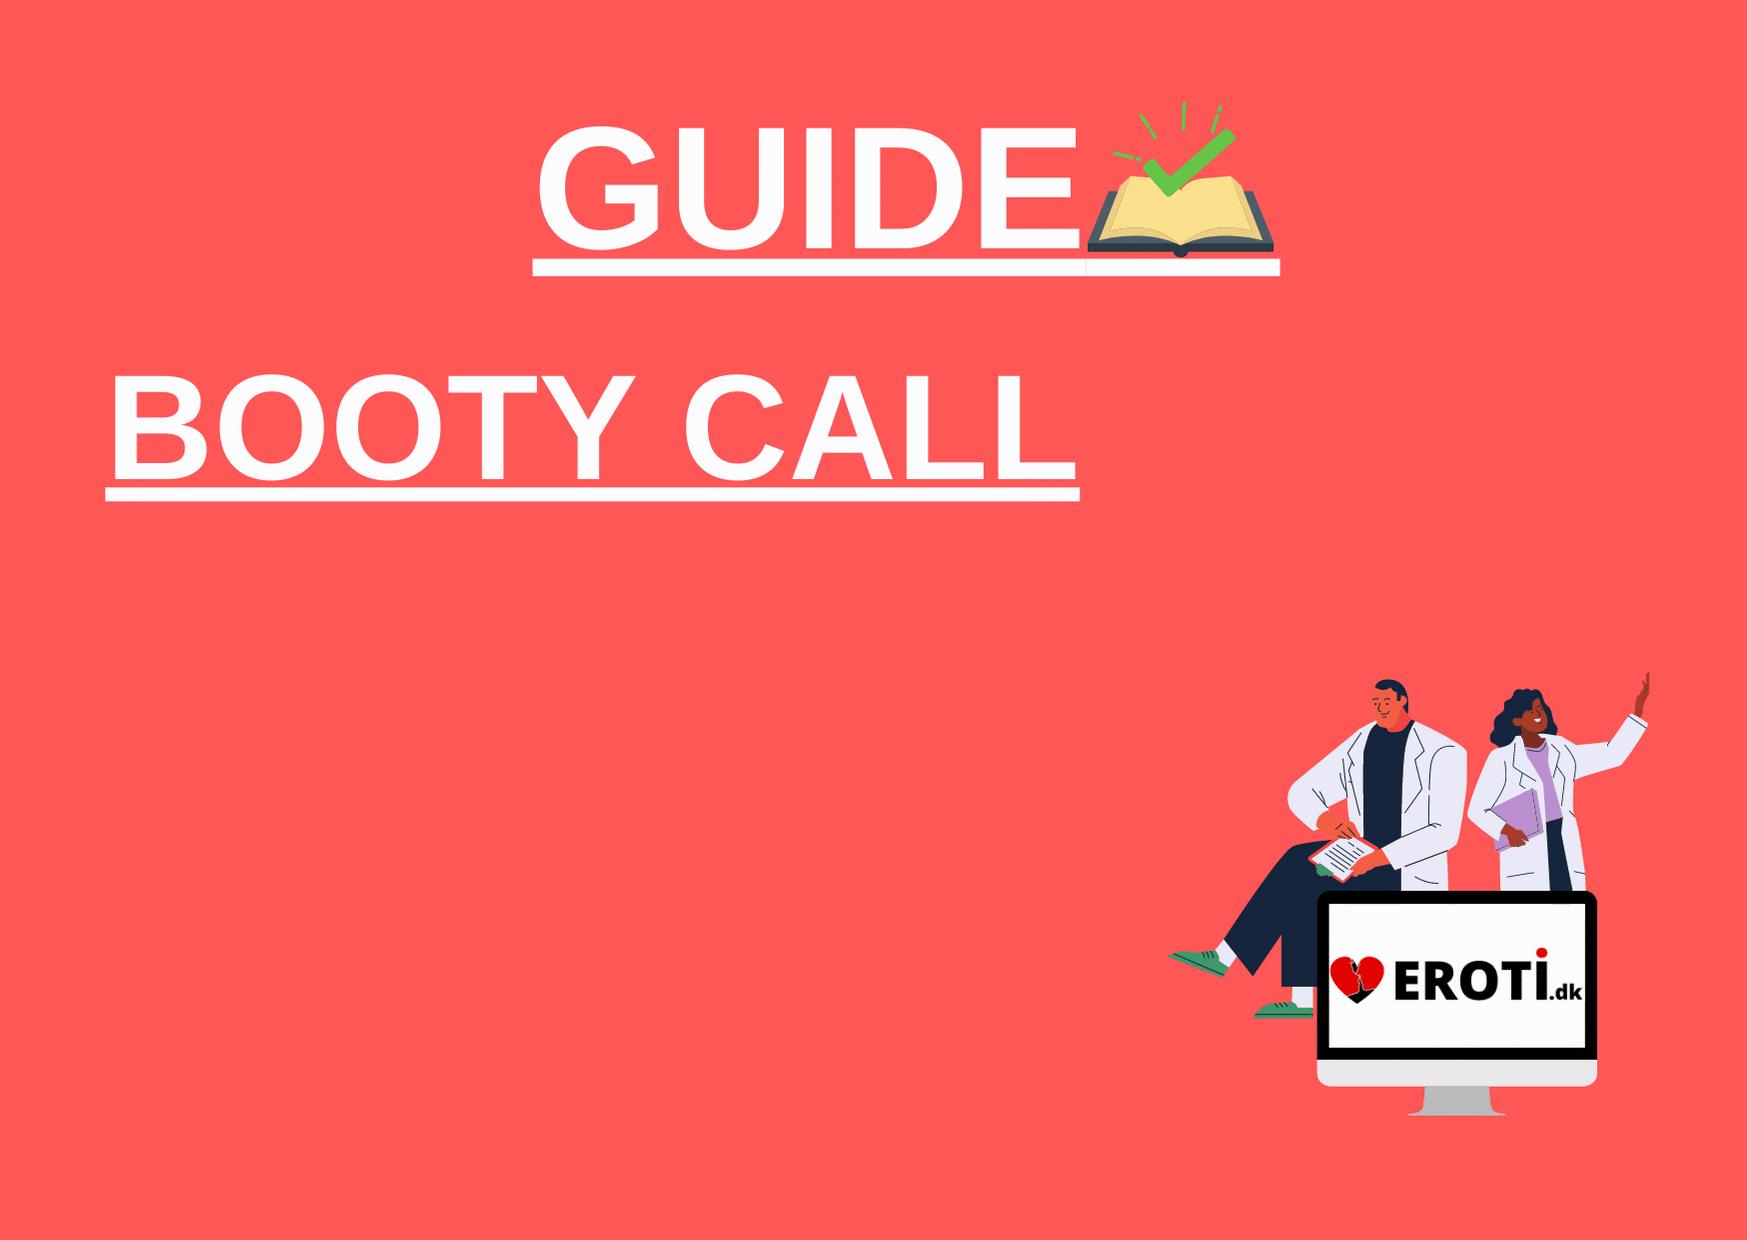 Booty call – Den ultimative guide til at få et booty call